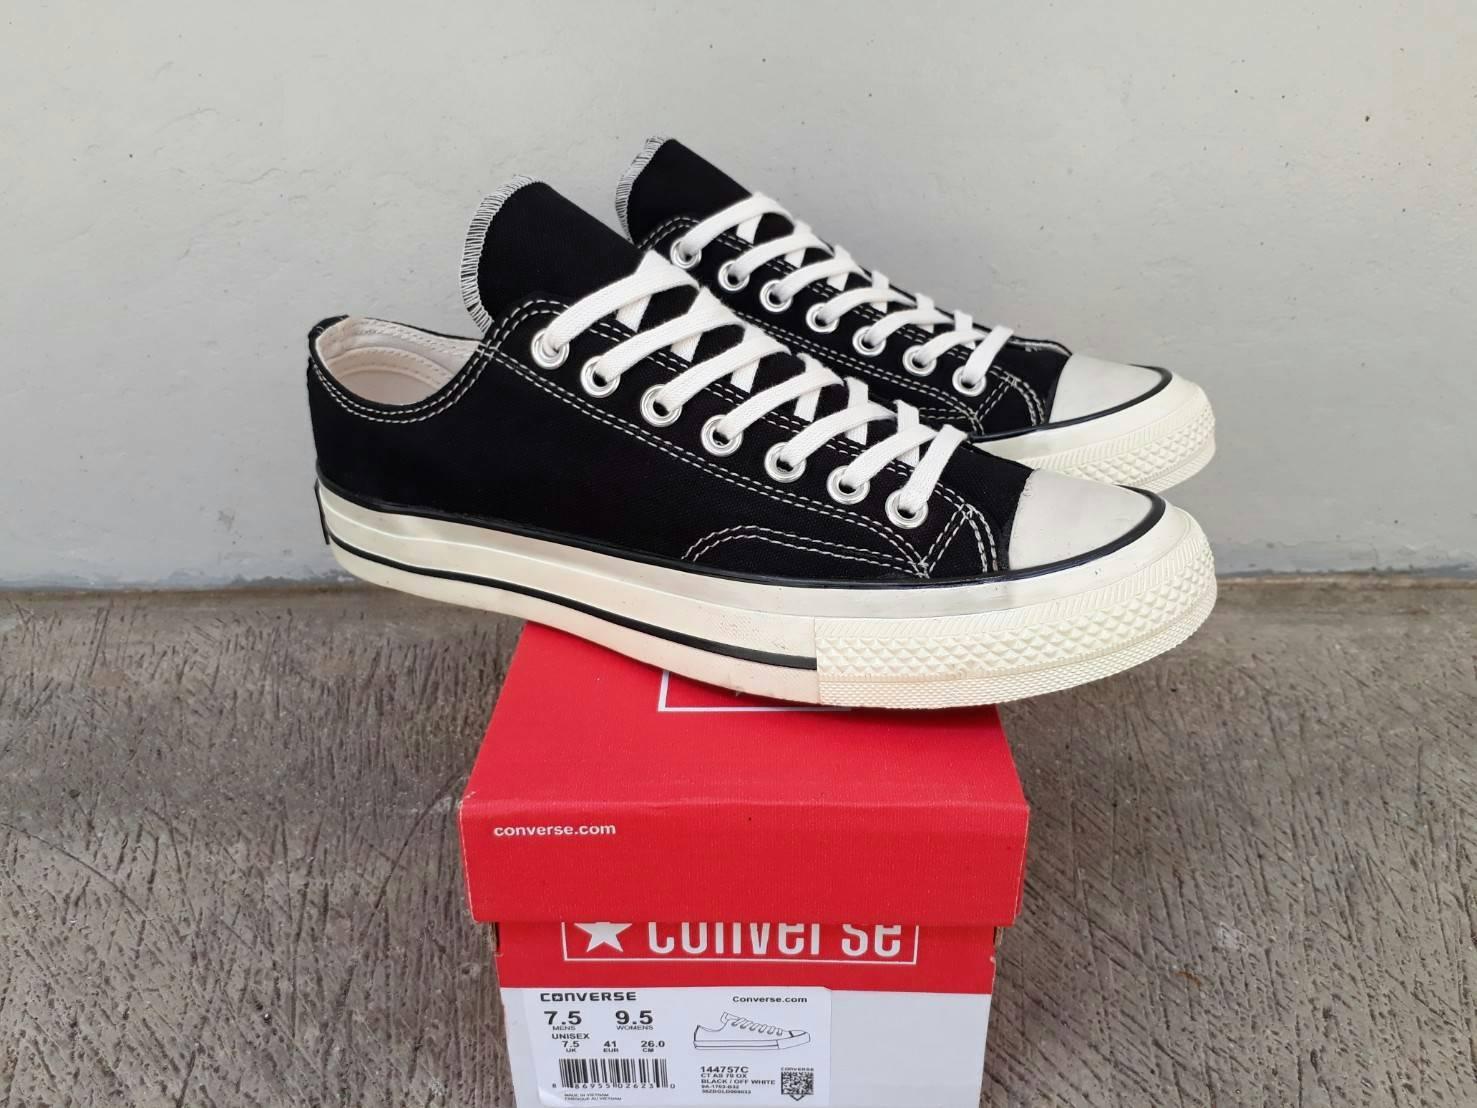 Kelebihan Sepatu Converse Low 70 S Black White Premium Bnib Made In Chuck Taylor 2 Original Vietnam 70s